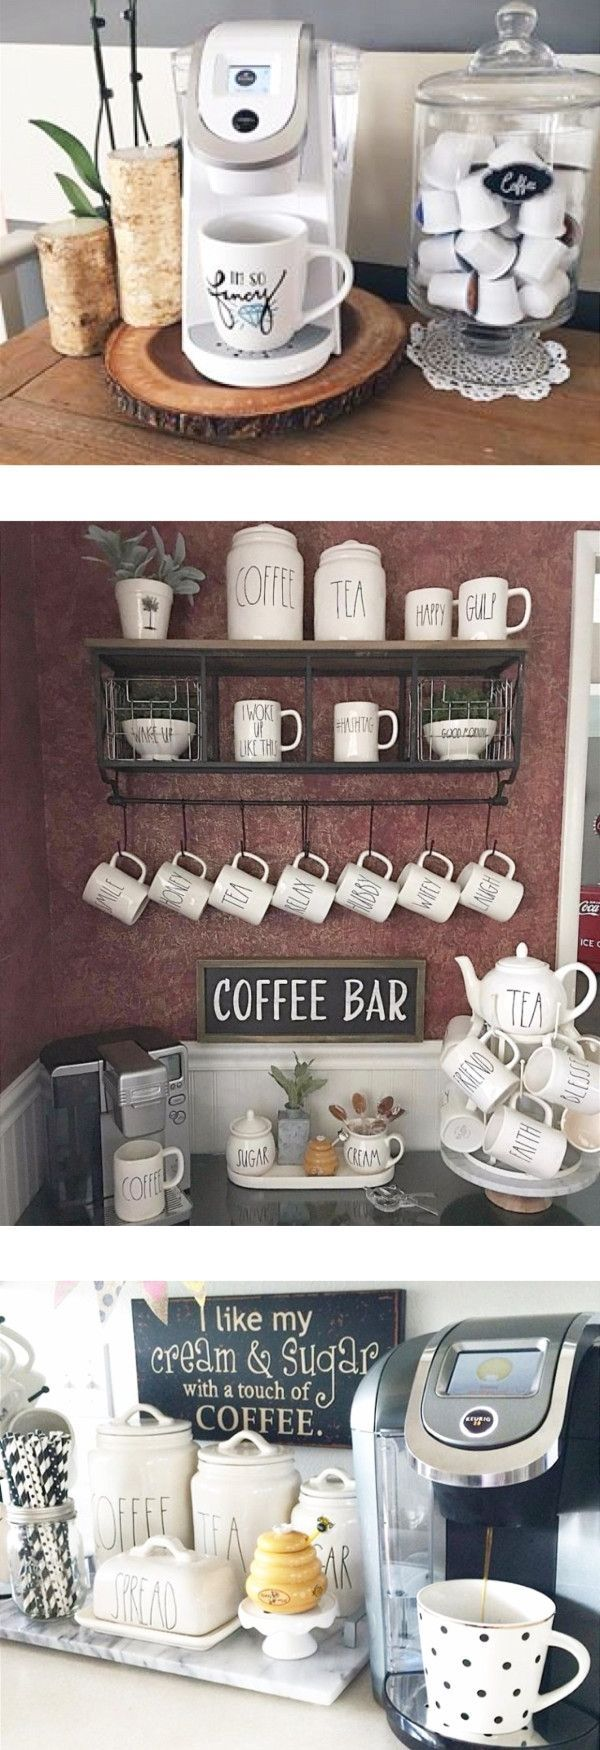 DIY Coffee Bar Ideas - Stunning Farmhouse Style Beverage Stations ...